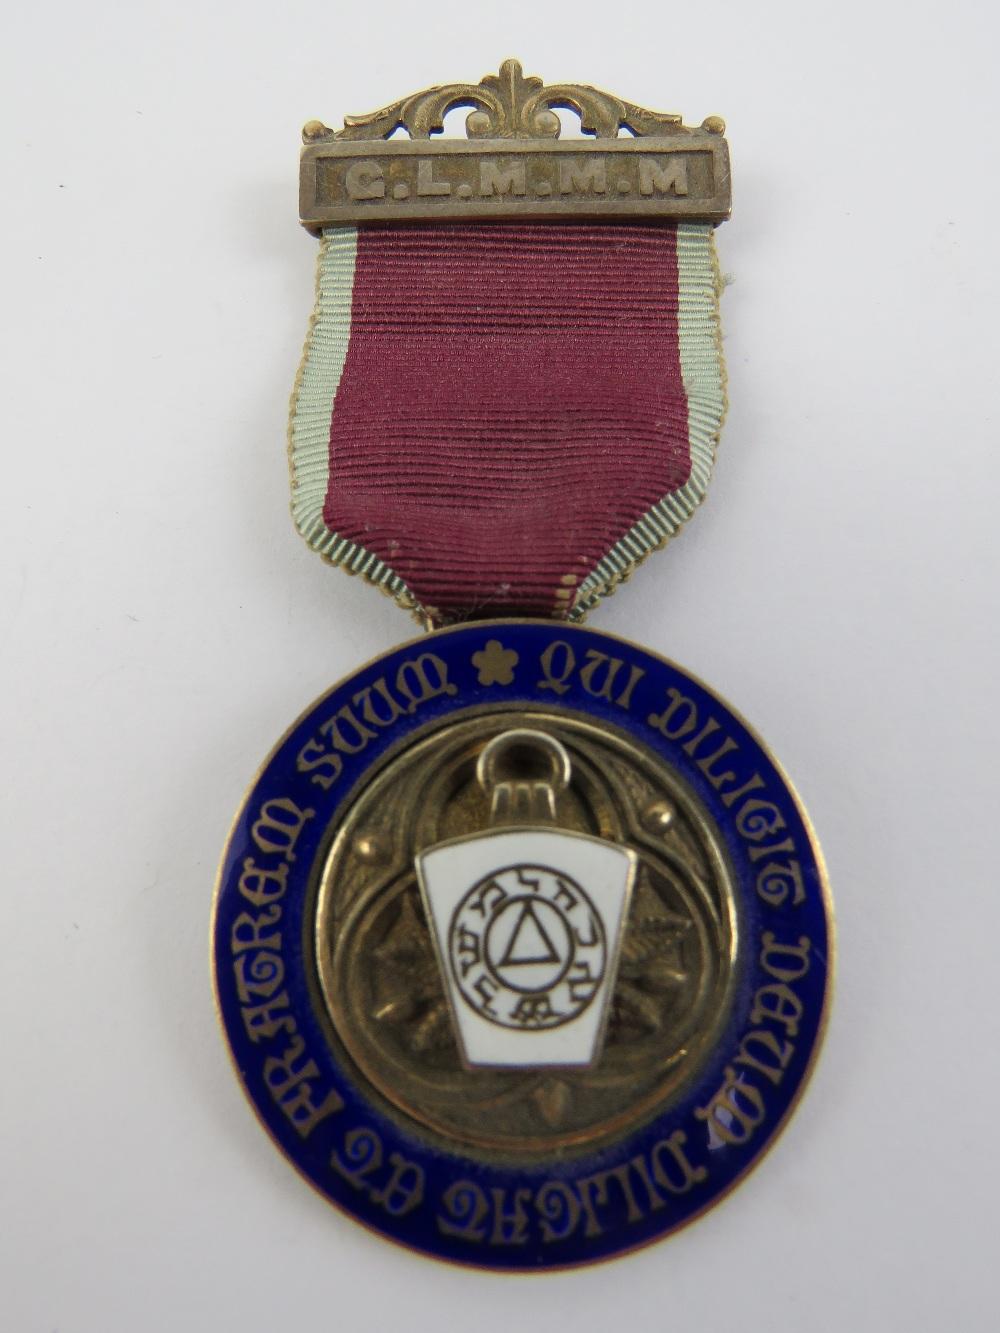 Lot 40 - A HM silver Grand Lodge Mark Master Masons jewel medal 'qui diligit deum diligat et fratrem suum'